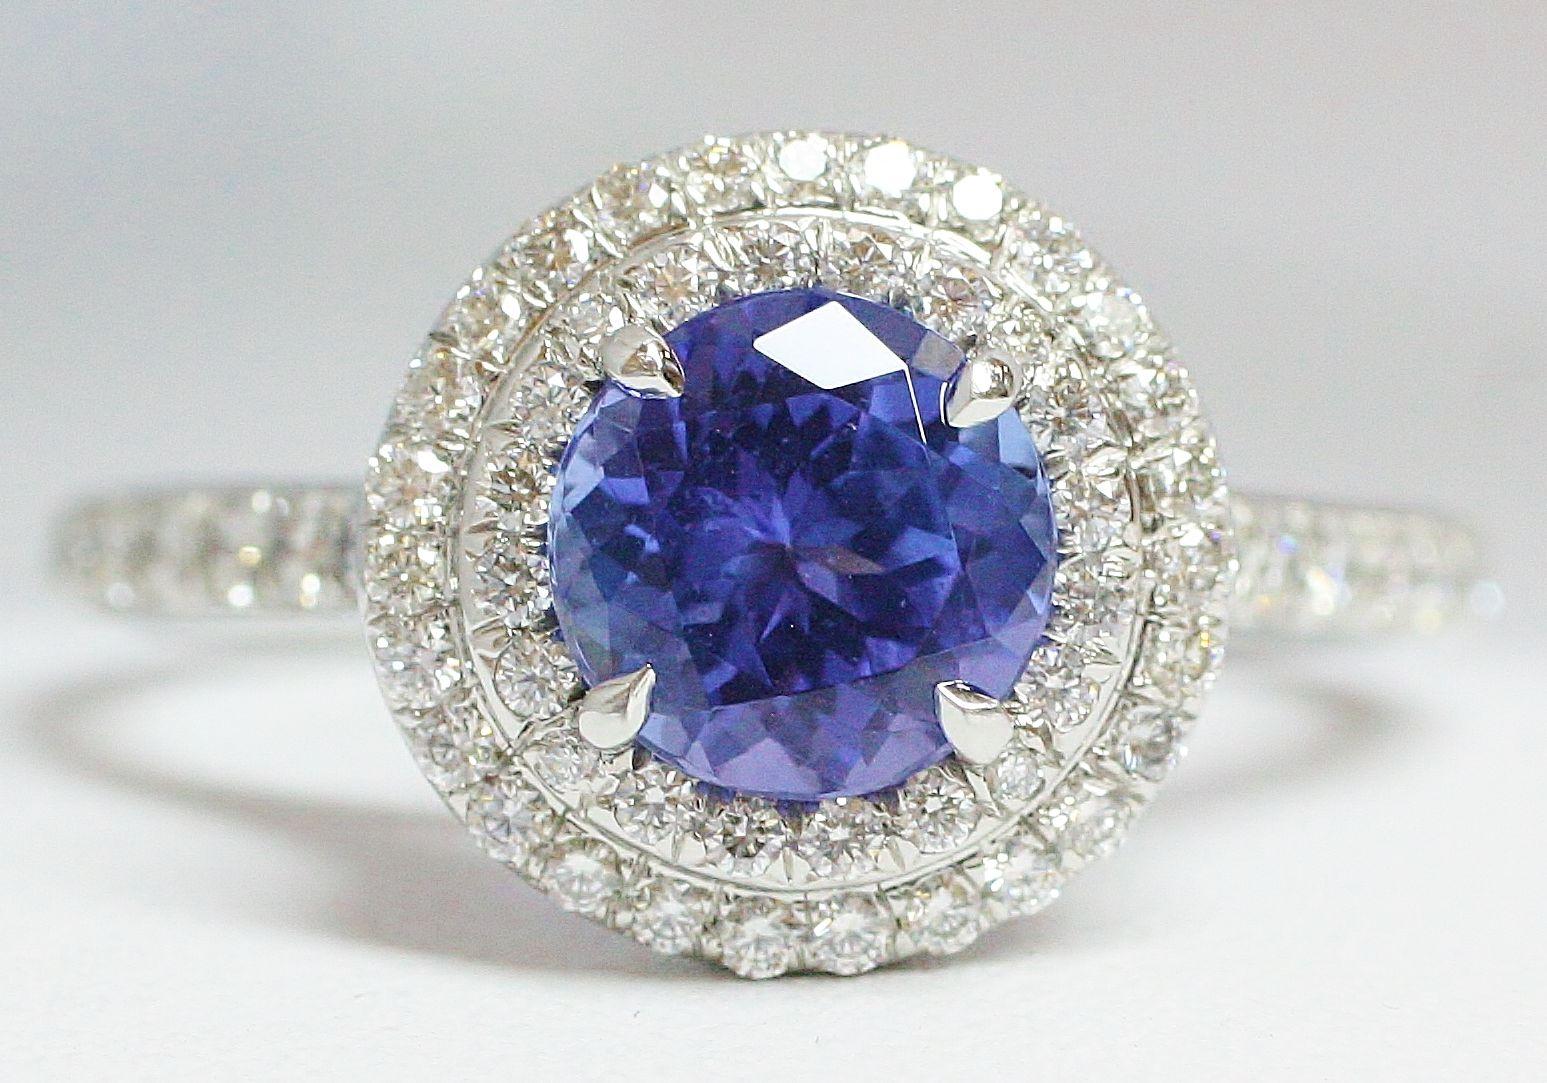 sell a tiffany tanzanite ring sacramento ca - Where To Sell Wedding Ring